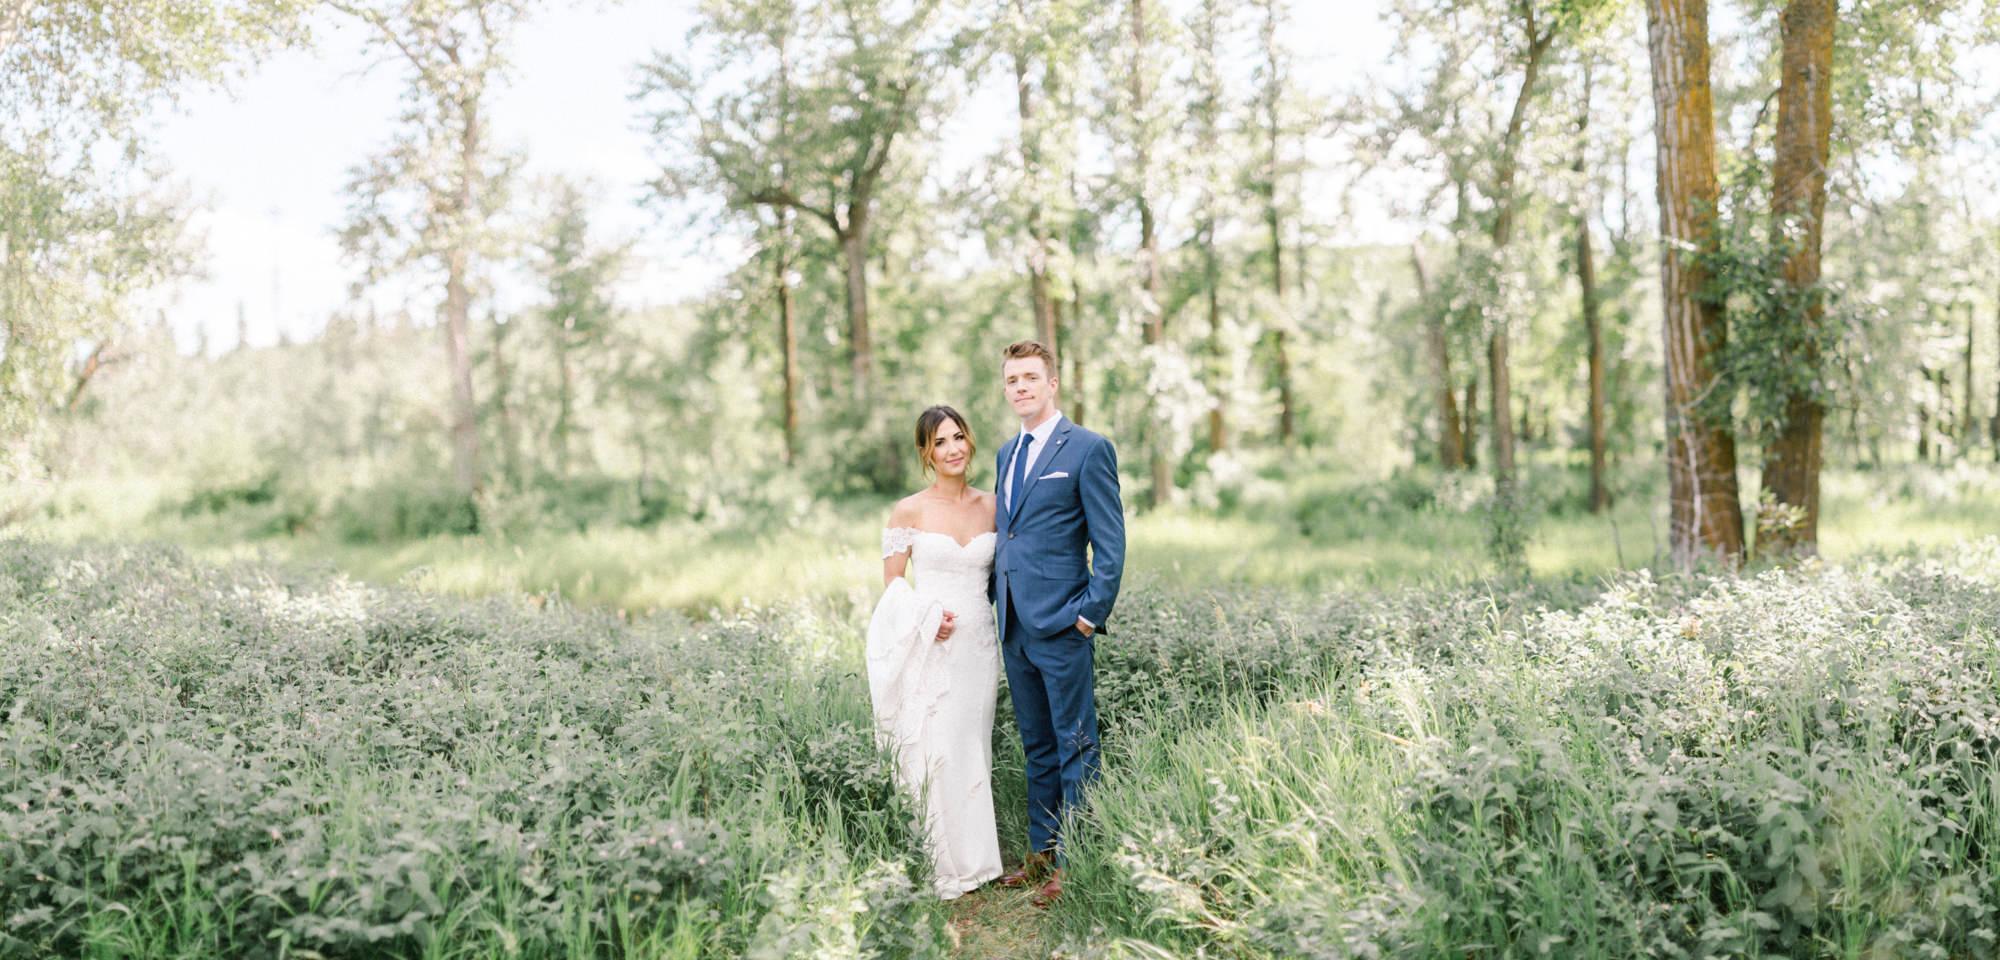 The-ranche-fish-creek-park-wedding-calgary-1.jpg